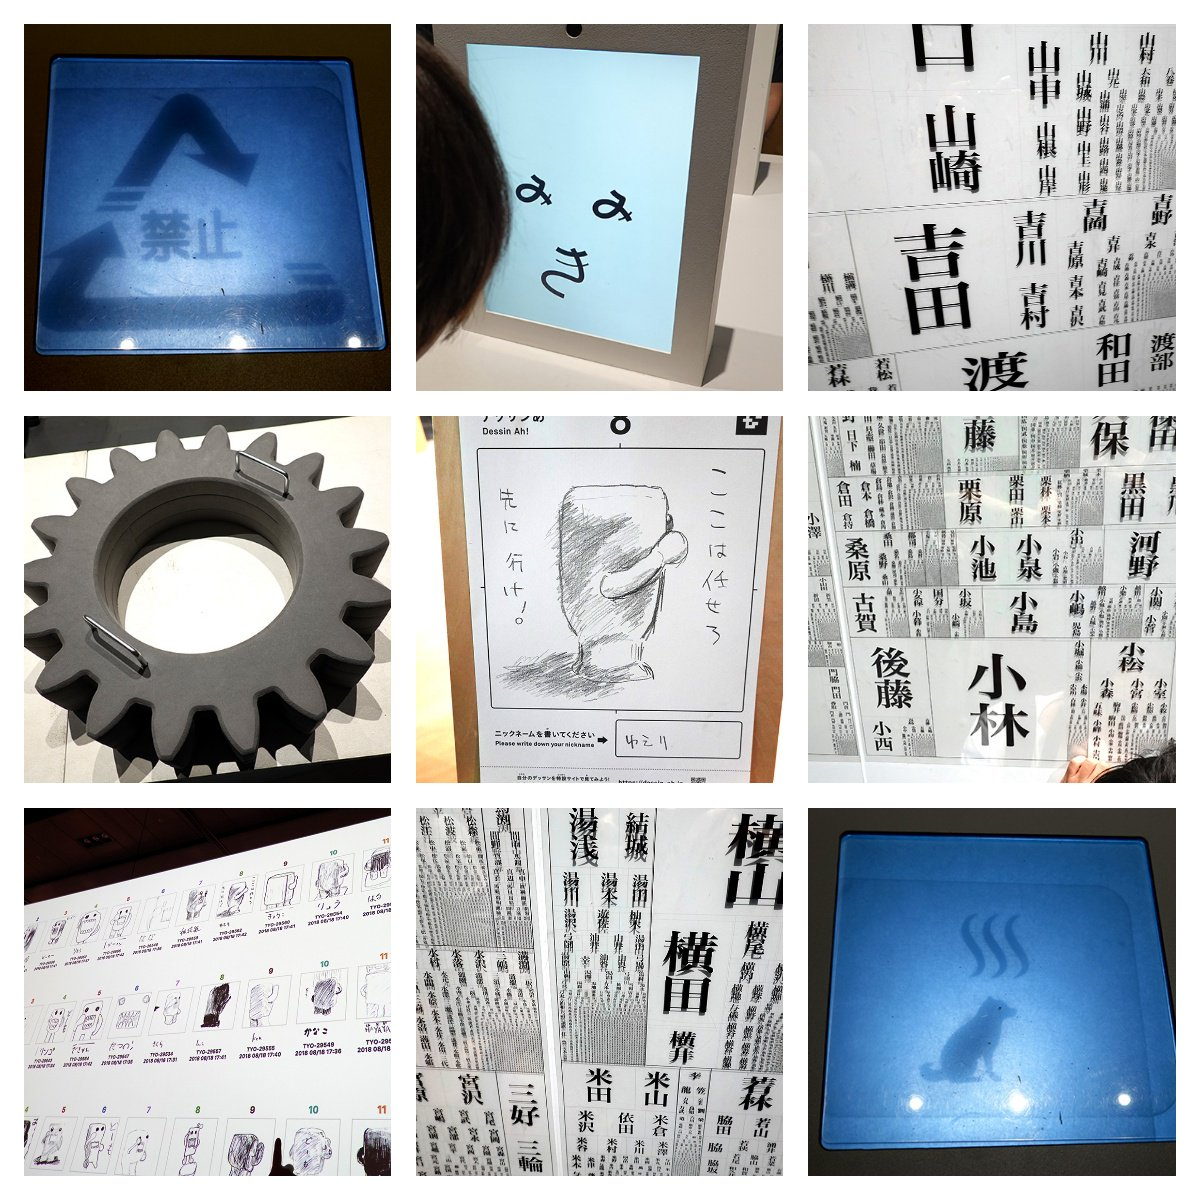 test ツイッターメディア - デザインあ(日本科学未来館) NHKのあの番組が展覧会に。番組と同様、大人も子供楽しい参加型。 体験型の中では、歯車になれるのでうっかり童心に。デッサンあも体験出来たりも(描いたのは私、友人が目立ちそうな台詞を考えてくれた)。 紋が円の組み合わせで描けるのも発見。 グッズも楽しく大満足 https://t.co/lRJLffHVKN